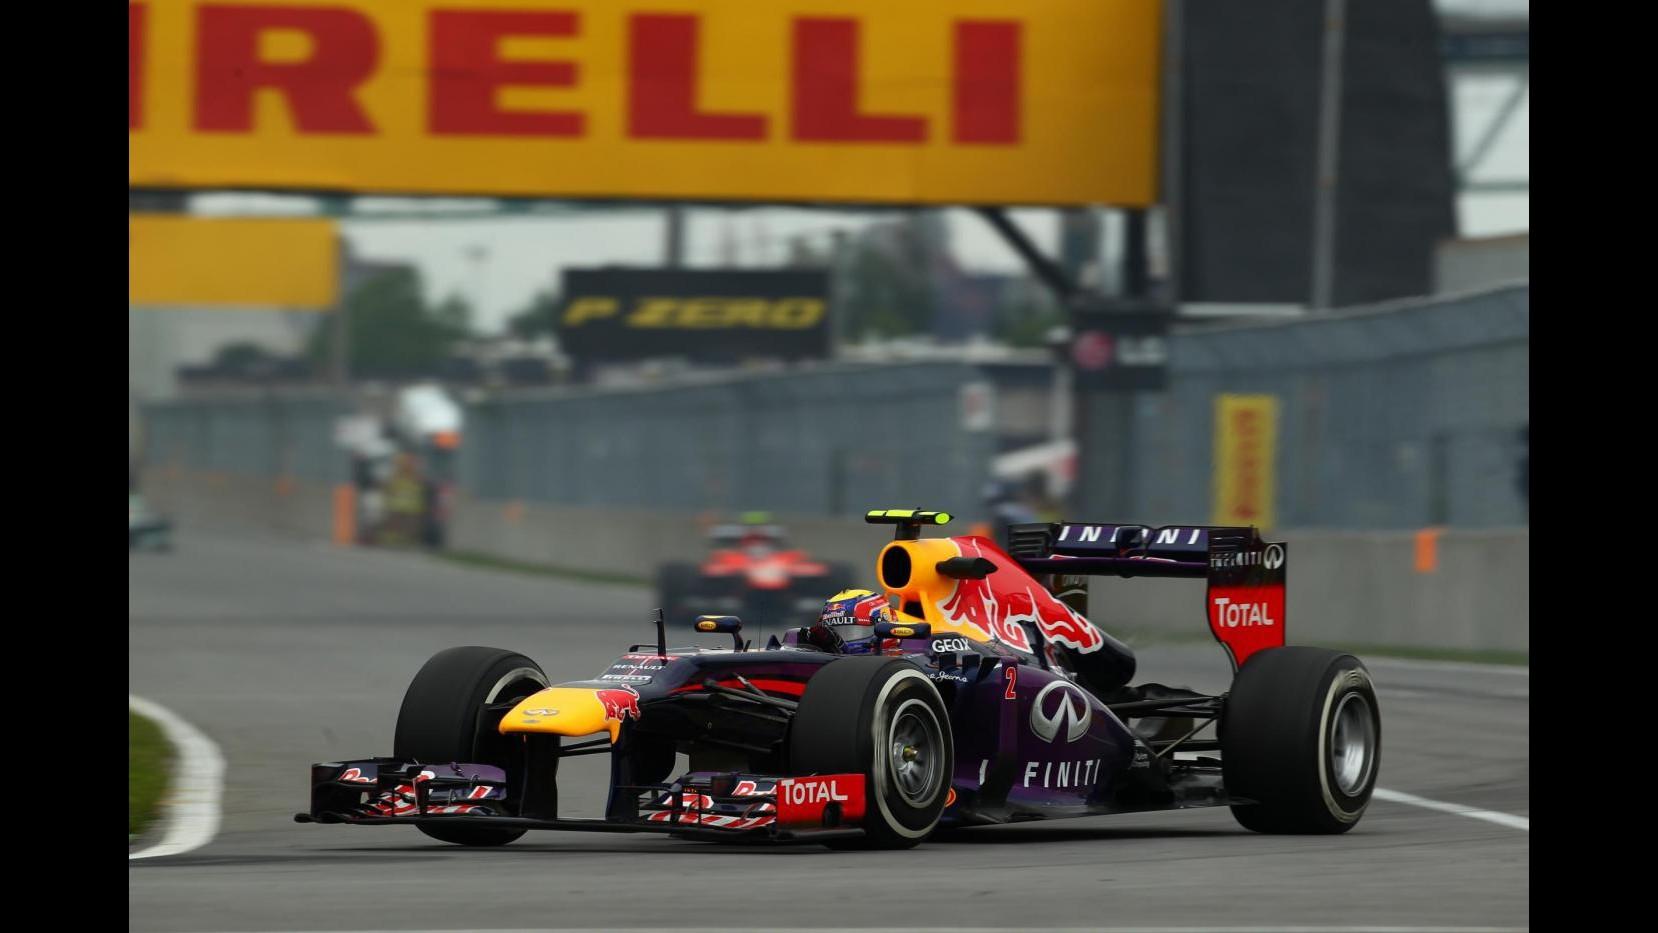 F1, Gp Canada: Webber più veloce in terze libere, Alonso 4°